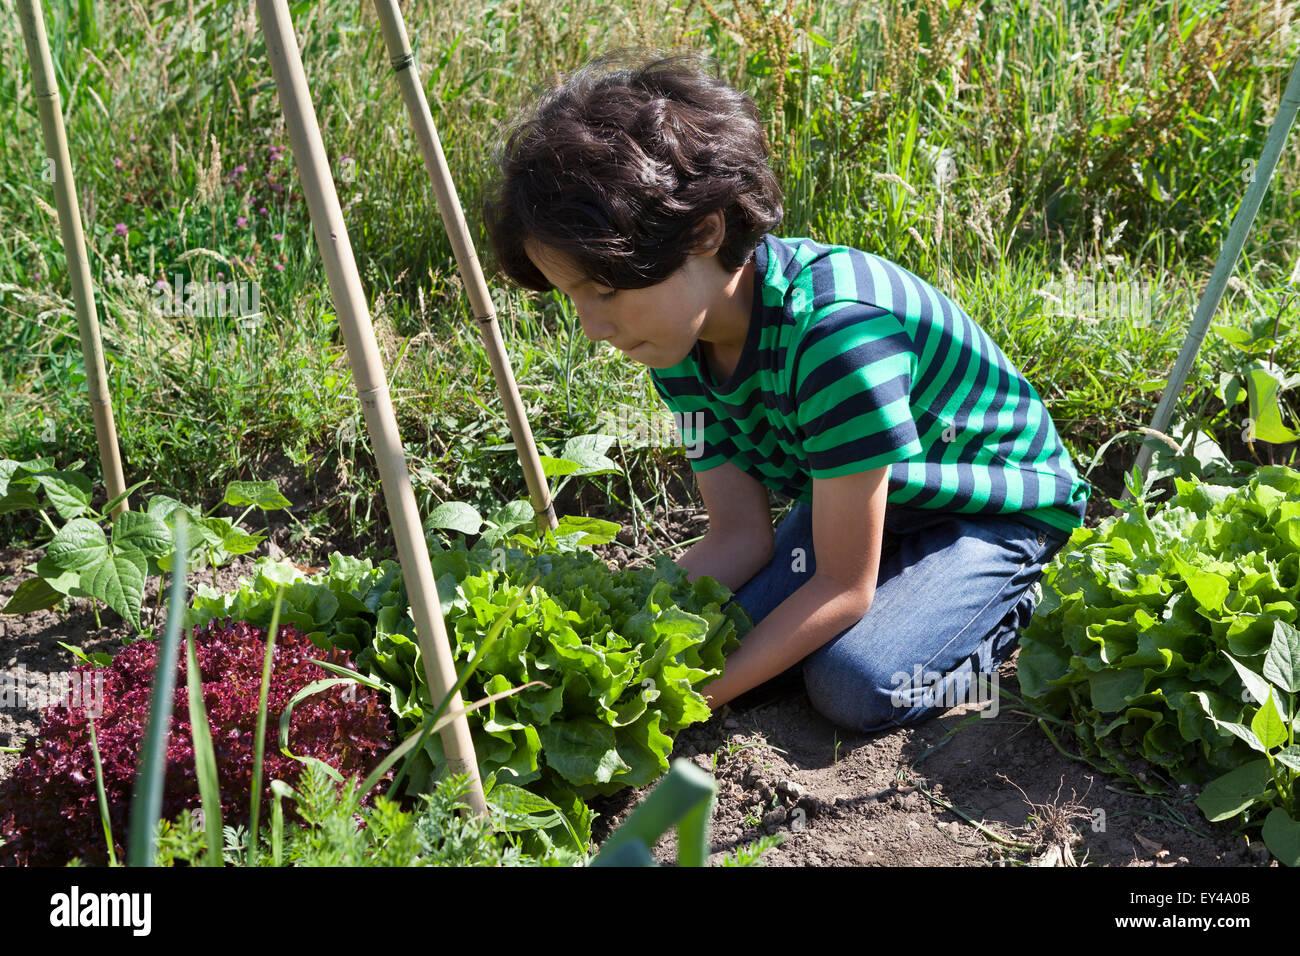 Little boy in the vegetable garden digging up fresh green endive - Stock Image